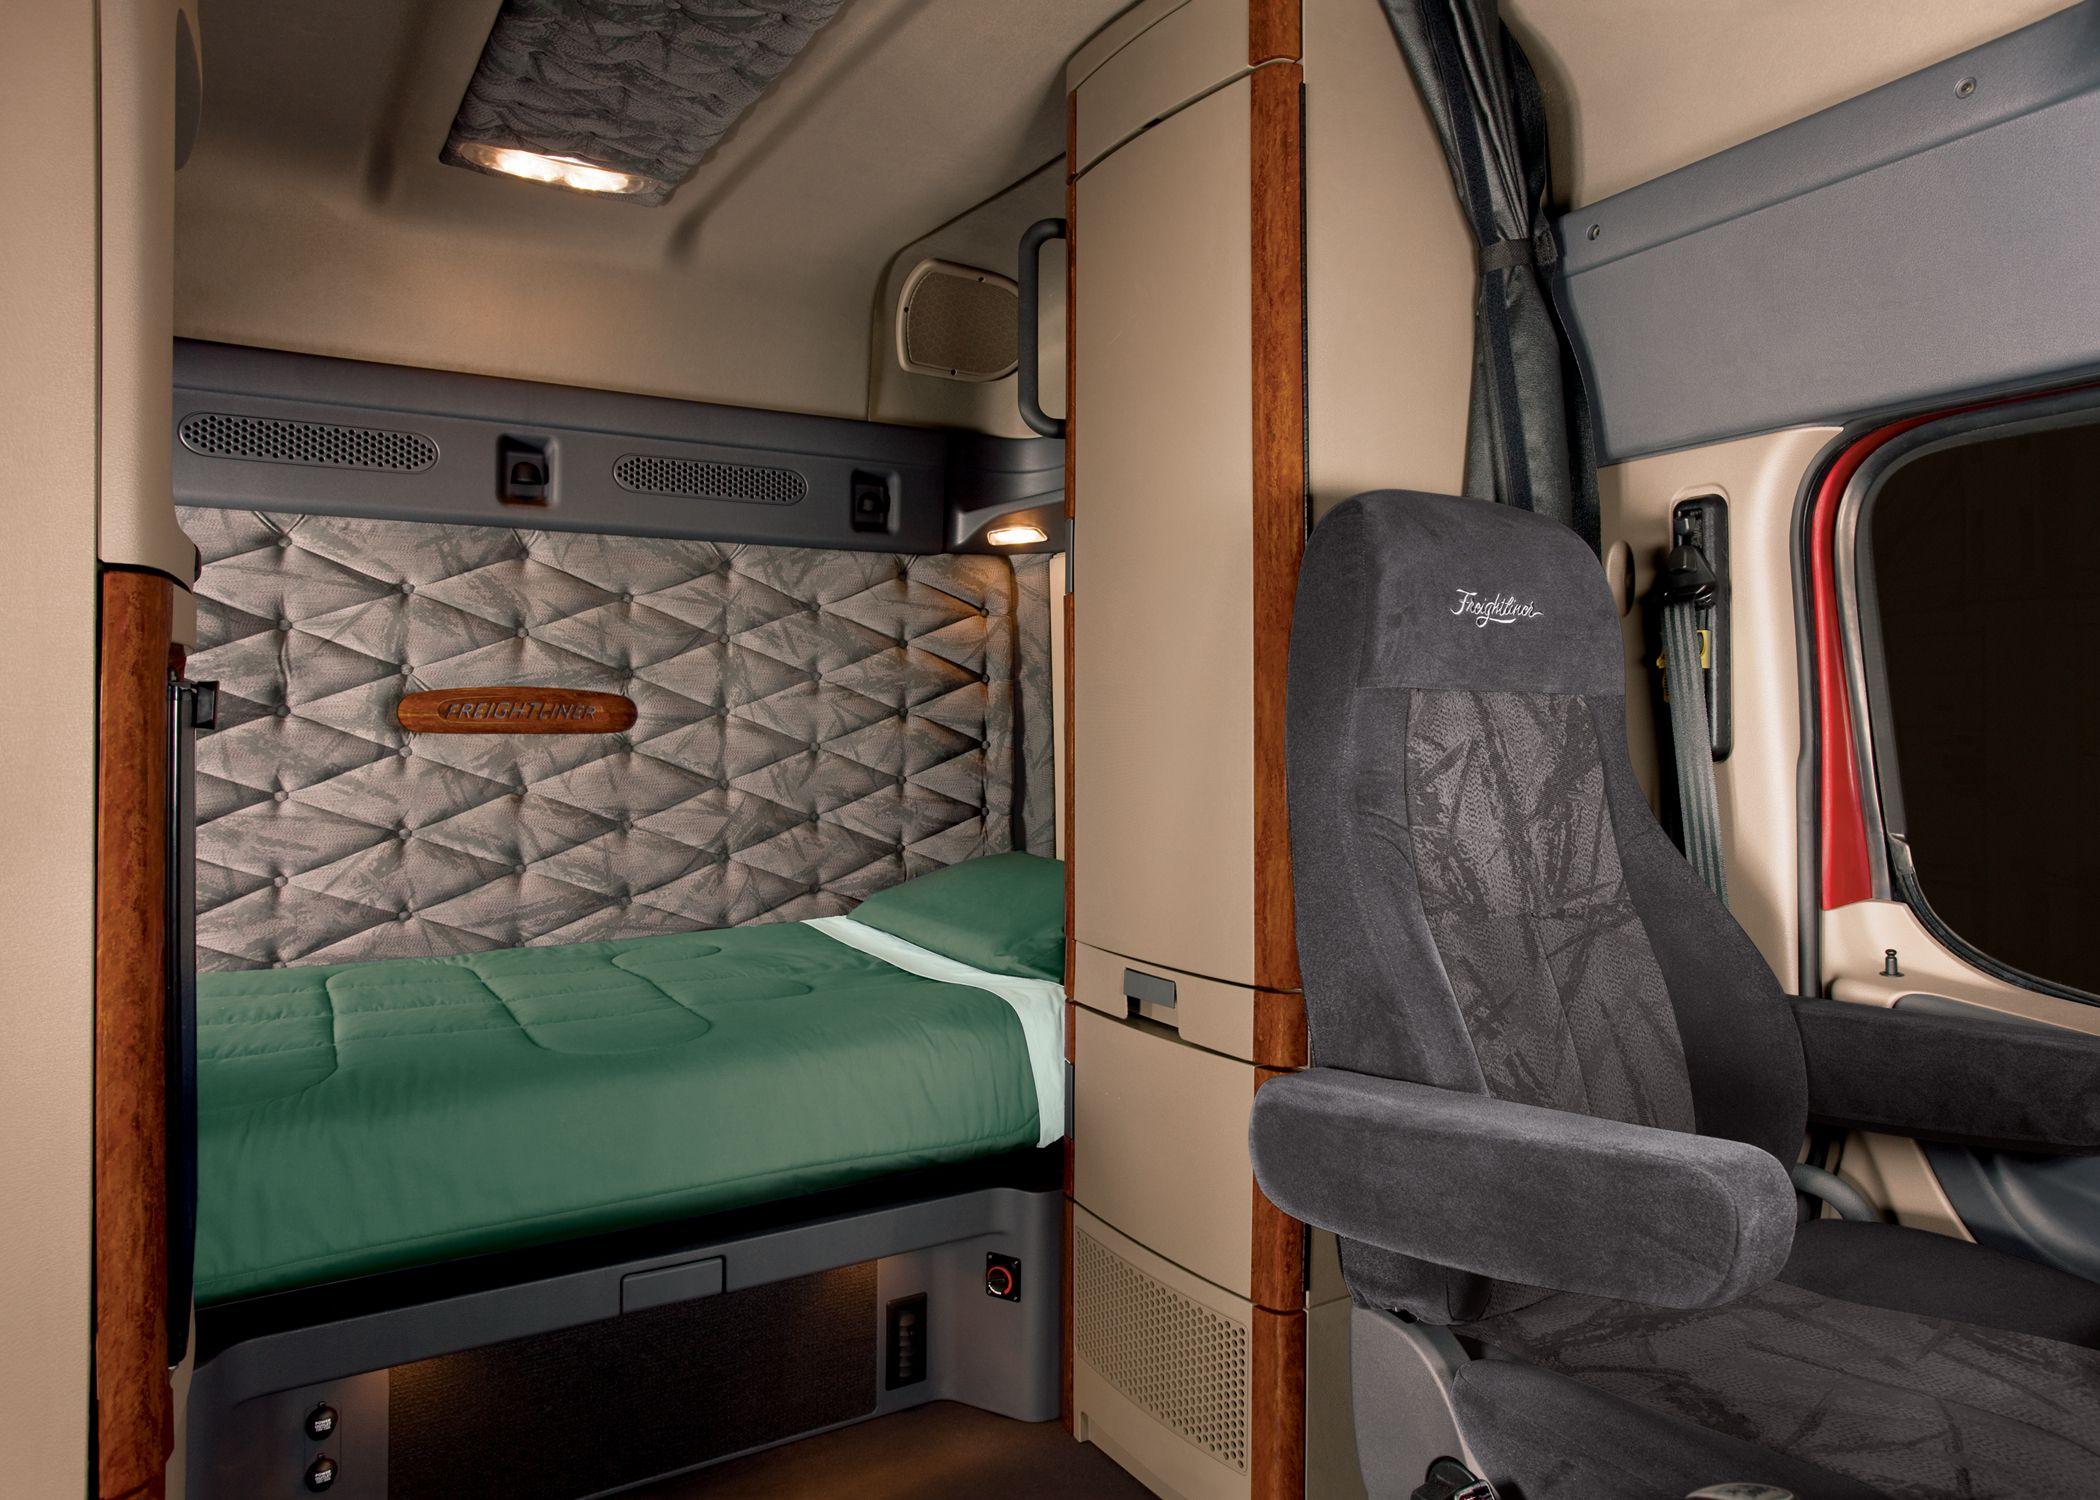 Freightliner cascadia freightliner cascadia kenworth - 2013 freightliner cascadia interior ...